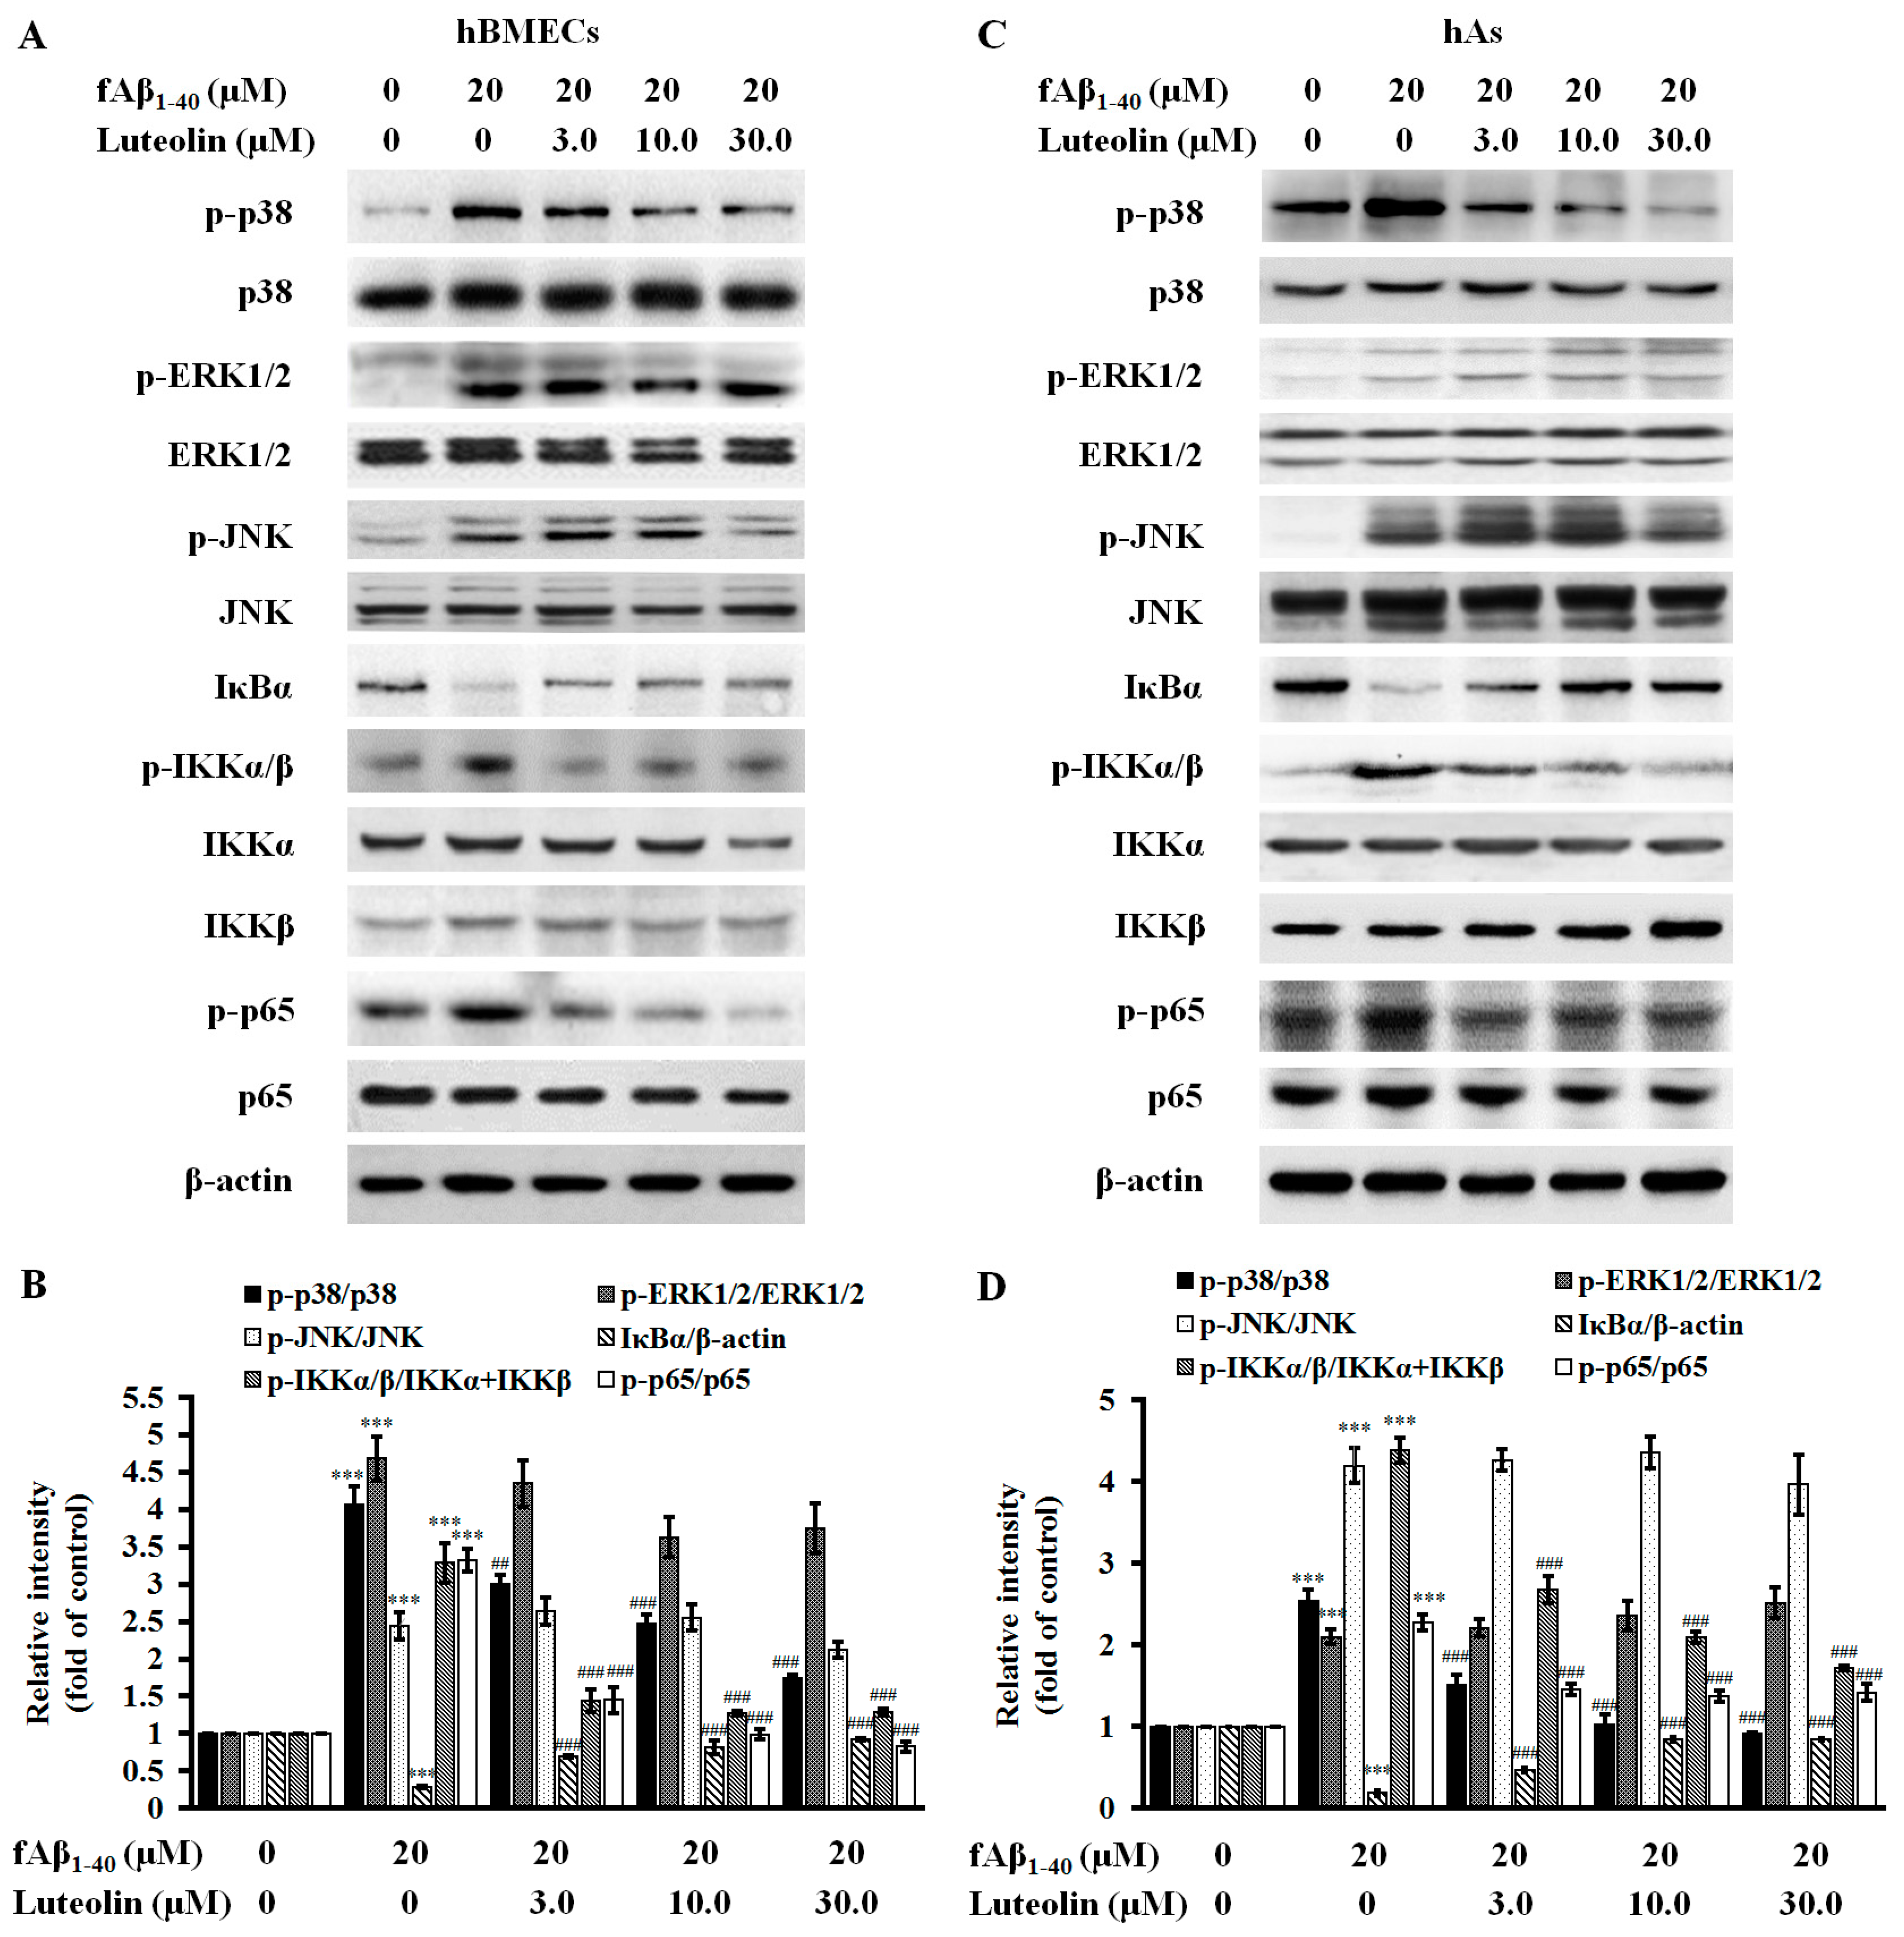 Molecules | Free Full-Text | Luteolin Inhibits Fibrillary β